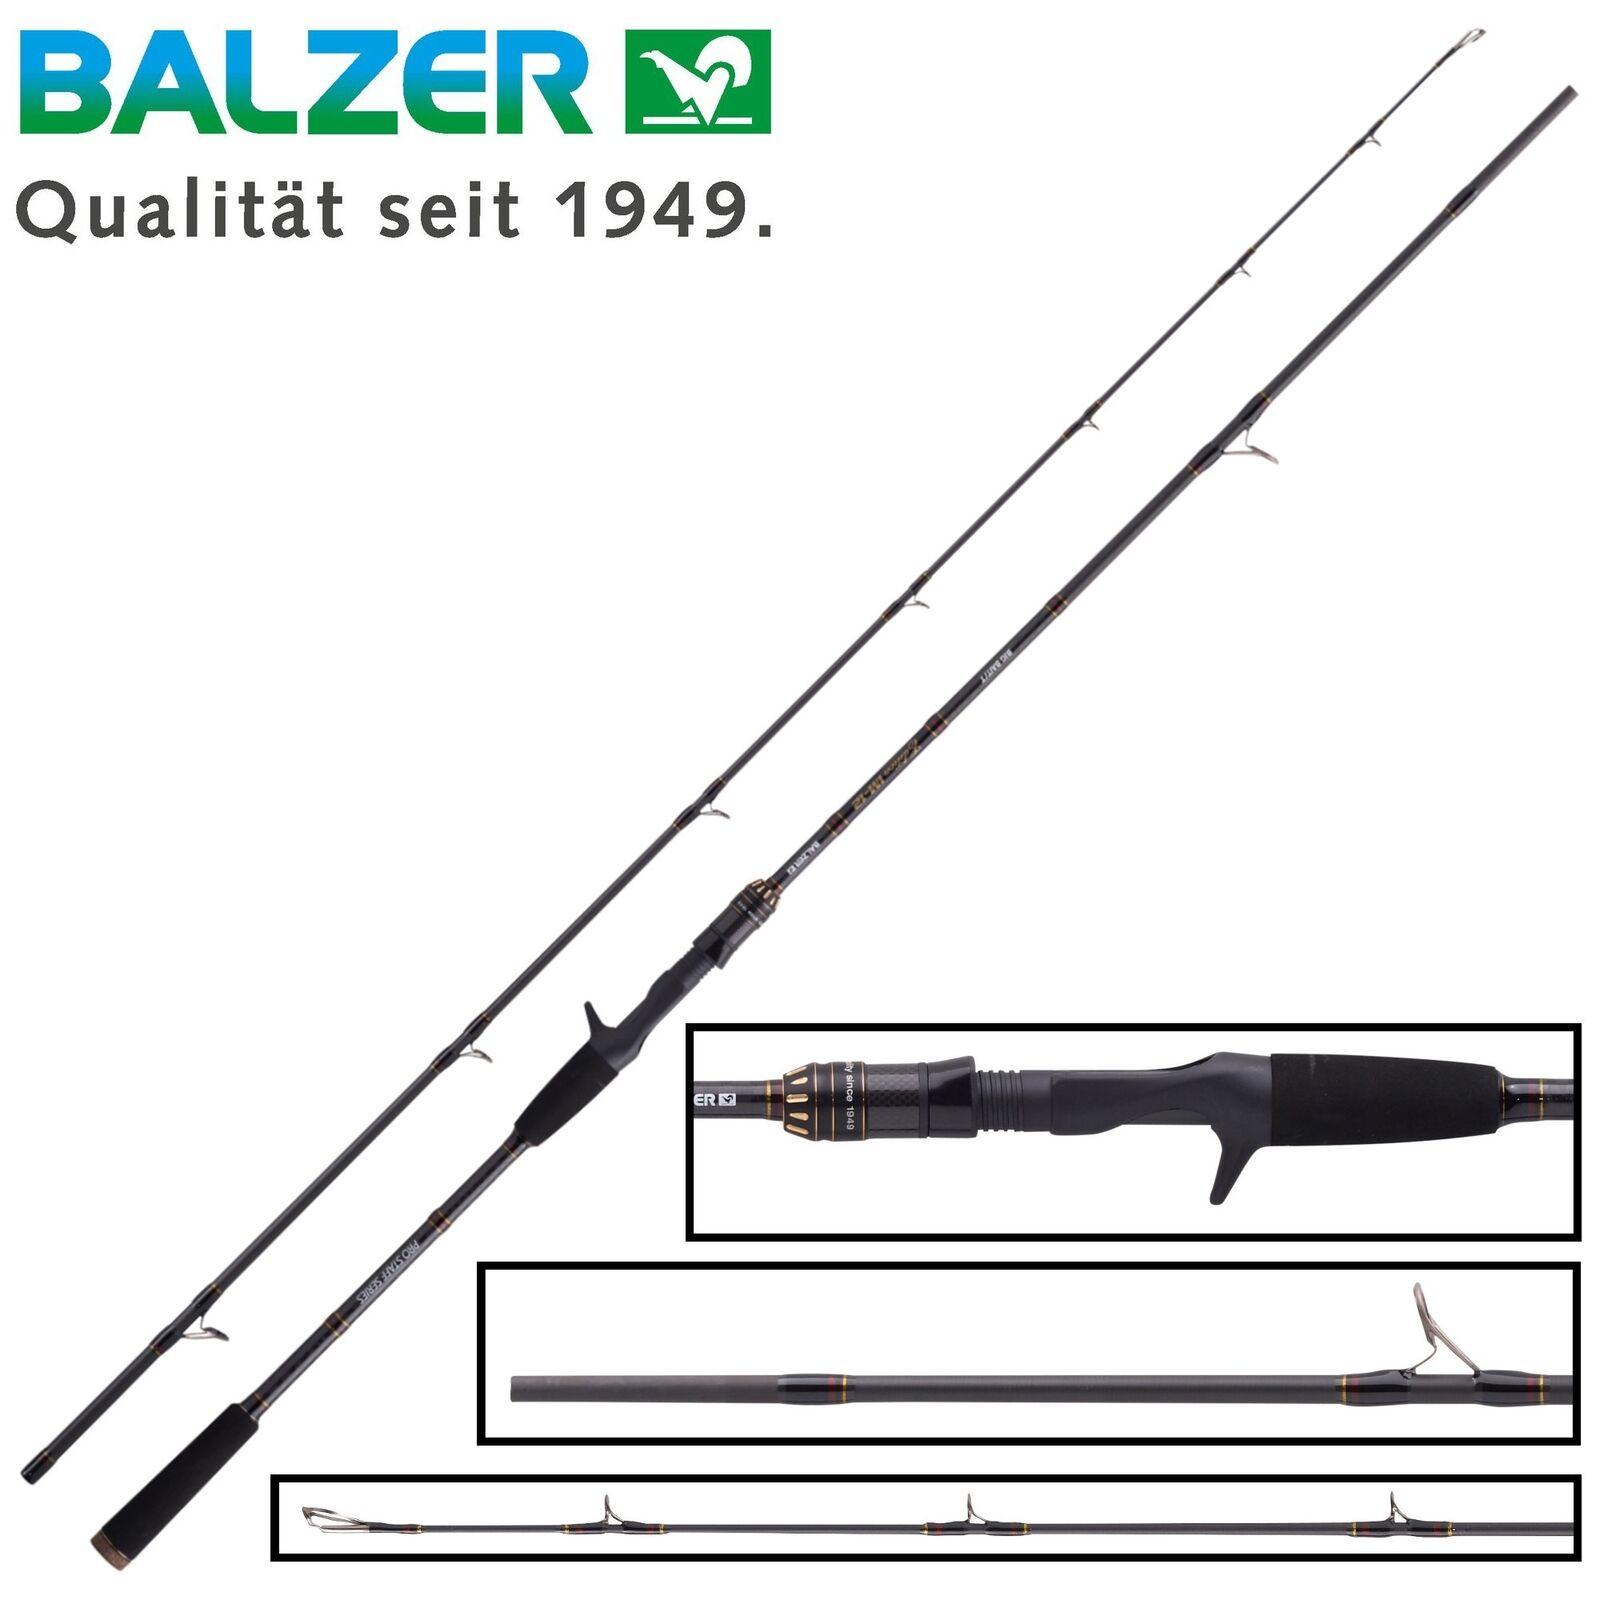 Balzer IM-12 Big Bait Trigger 2 41m 140-225g - Hechtrute Spinnrute Angelrute